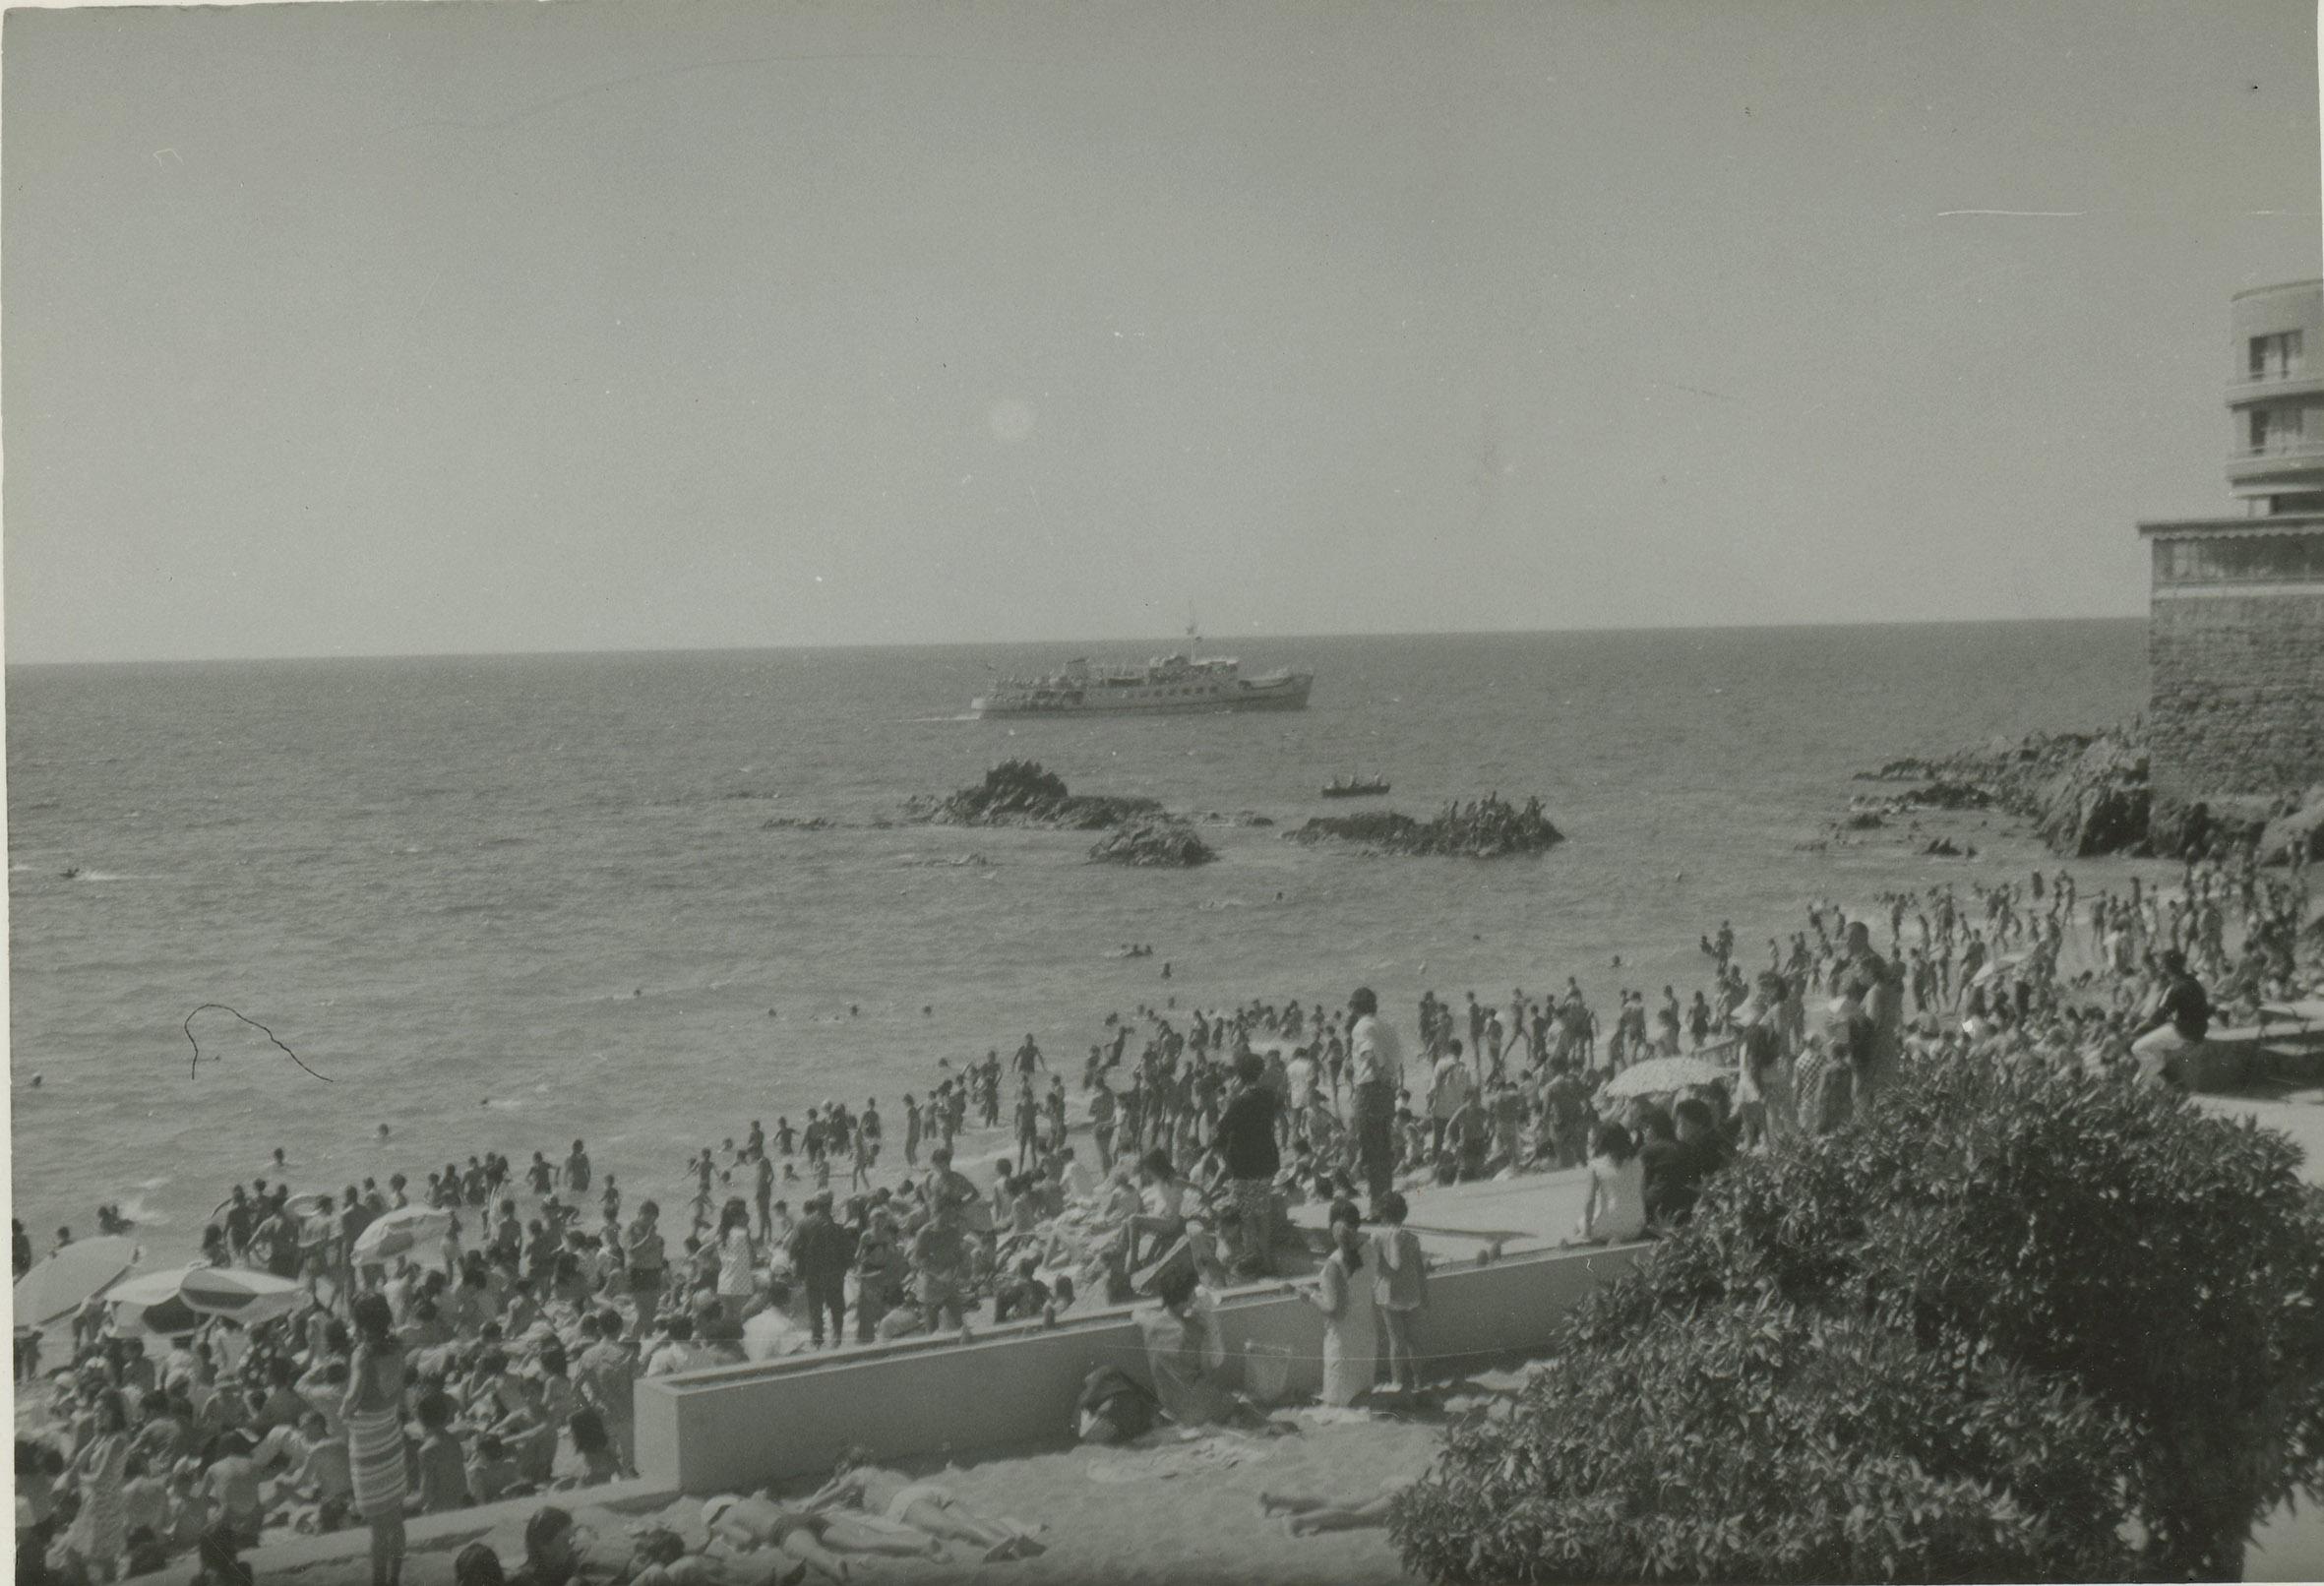 Enterreno - Fotos históricas de chile - fotos antiguas de Chile - Caleta Abarca de Viña del Mar en 1969